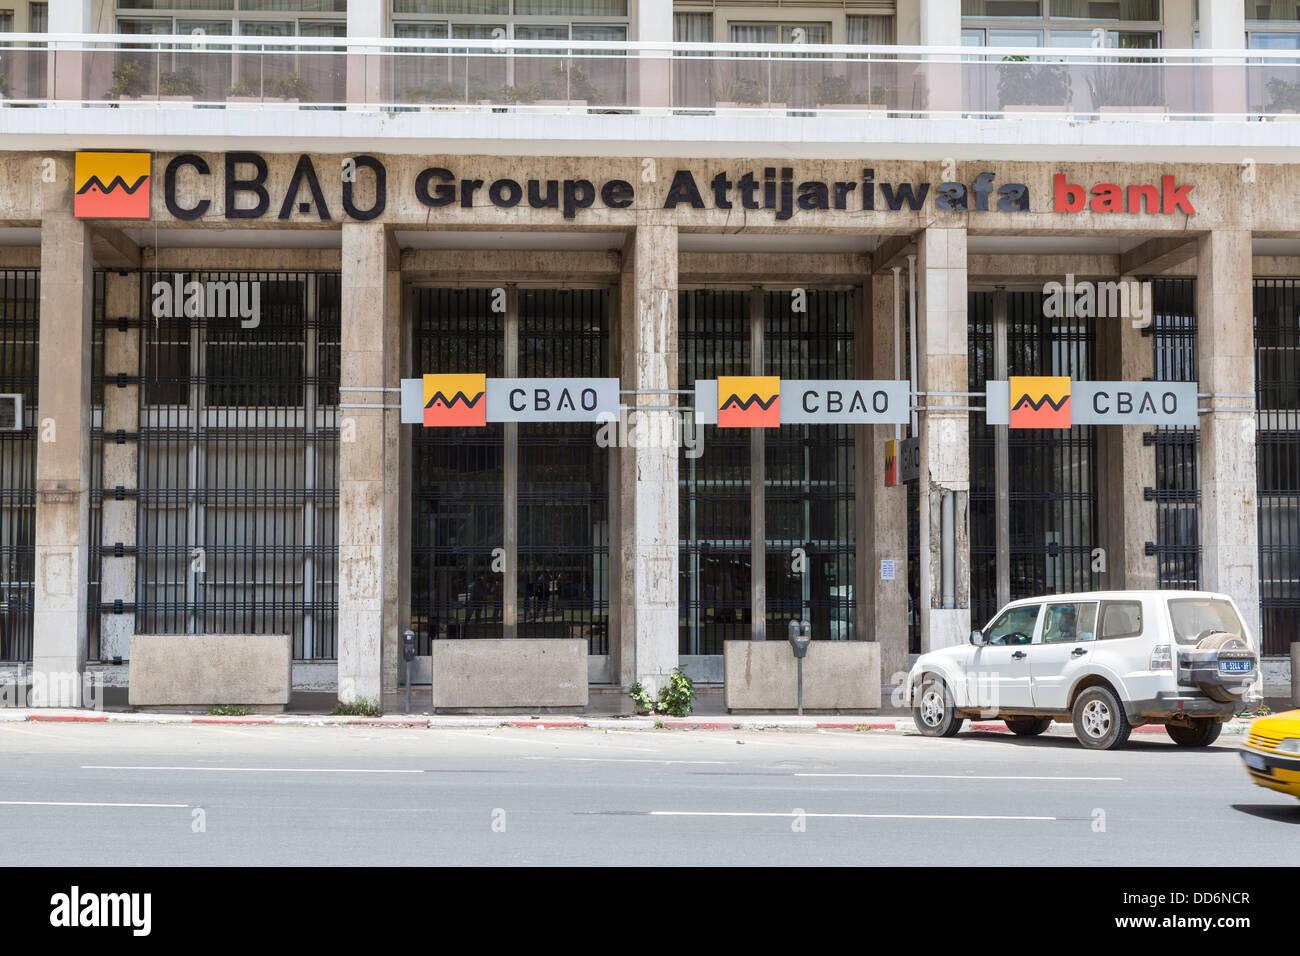 Dakar, Senegal. CBAO Bank, Banking Company of West Africa (Compagnie Bancaire de l'Afrique Occidentale). - Stock Image